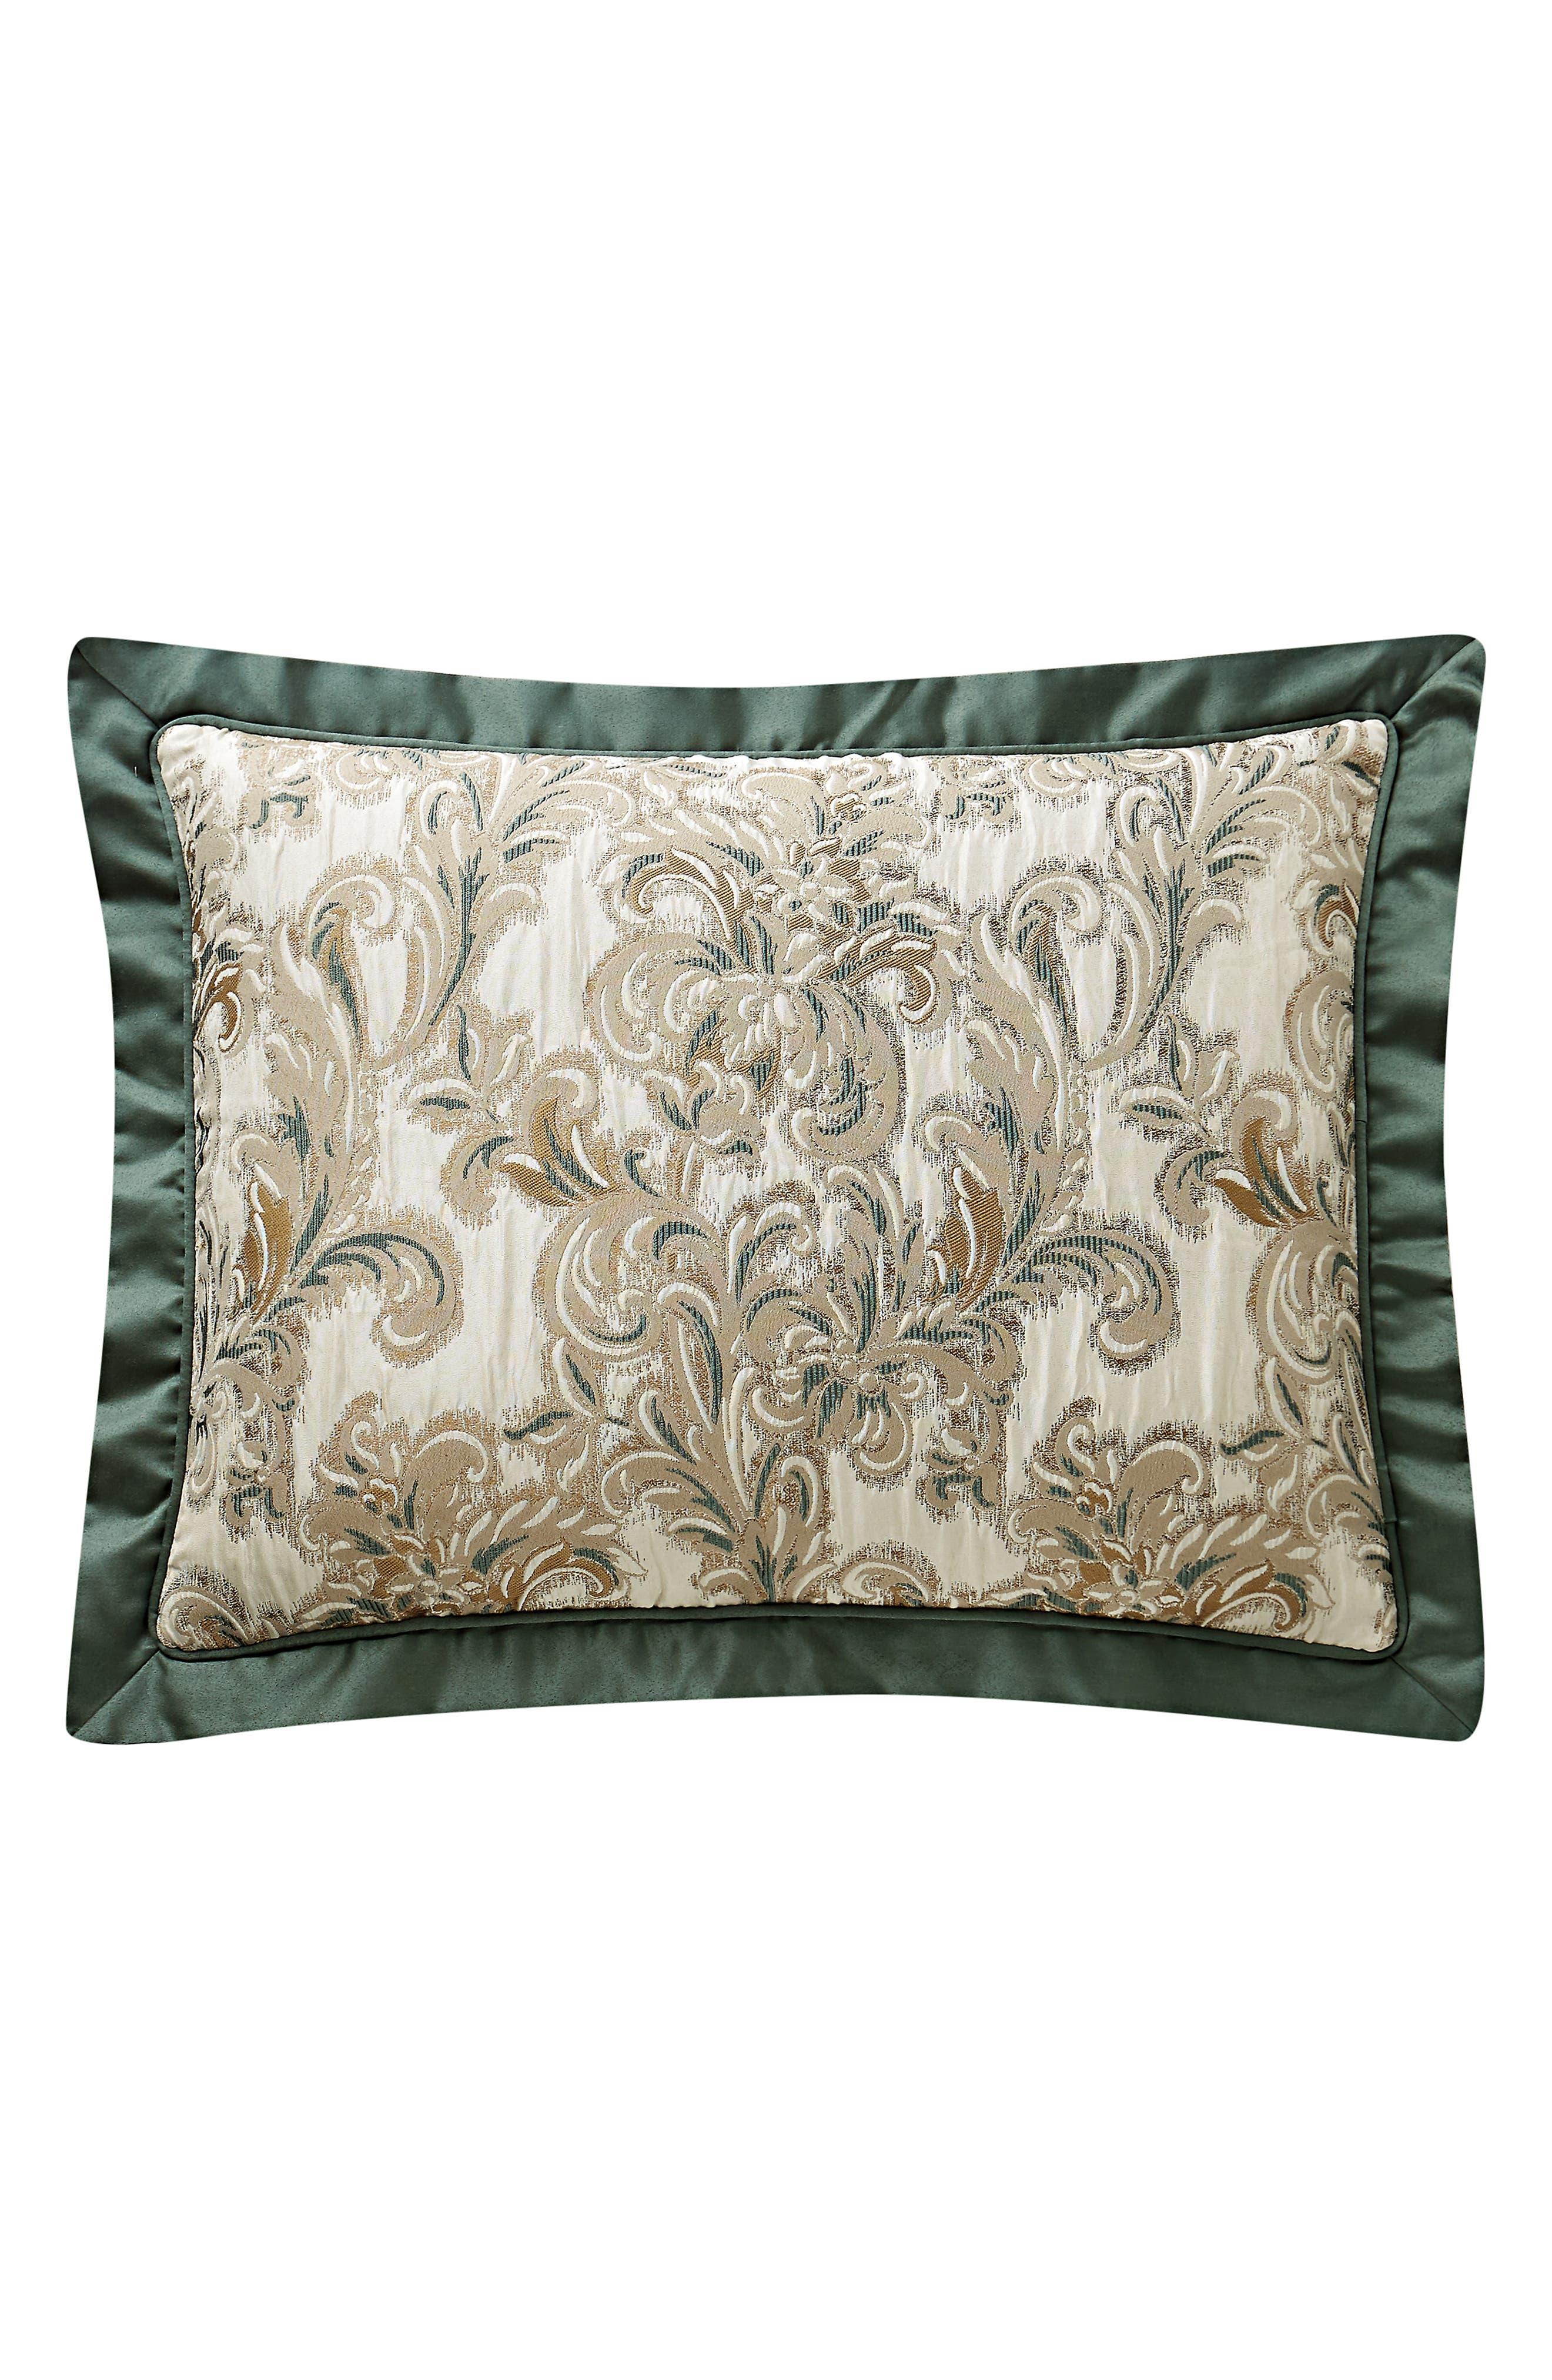 WATERFORD, Anora Comforter, Sham & Bed Skirt Set, Alternate thumbnail 7, color, BRASS/ JADE